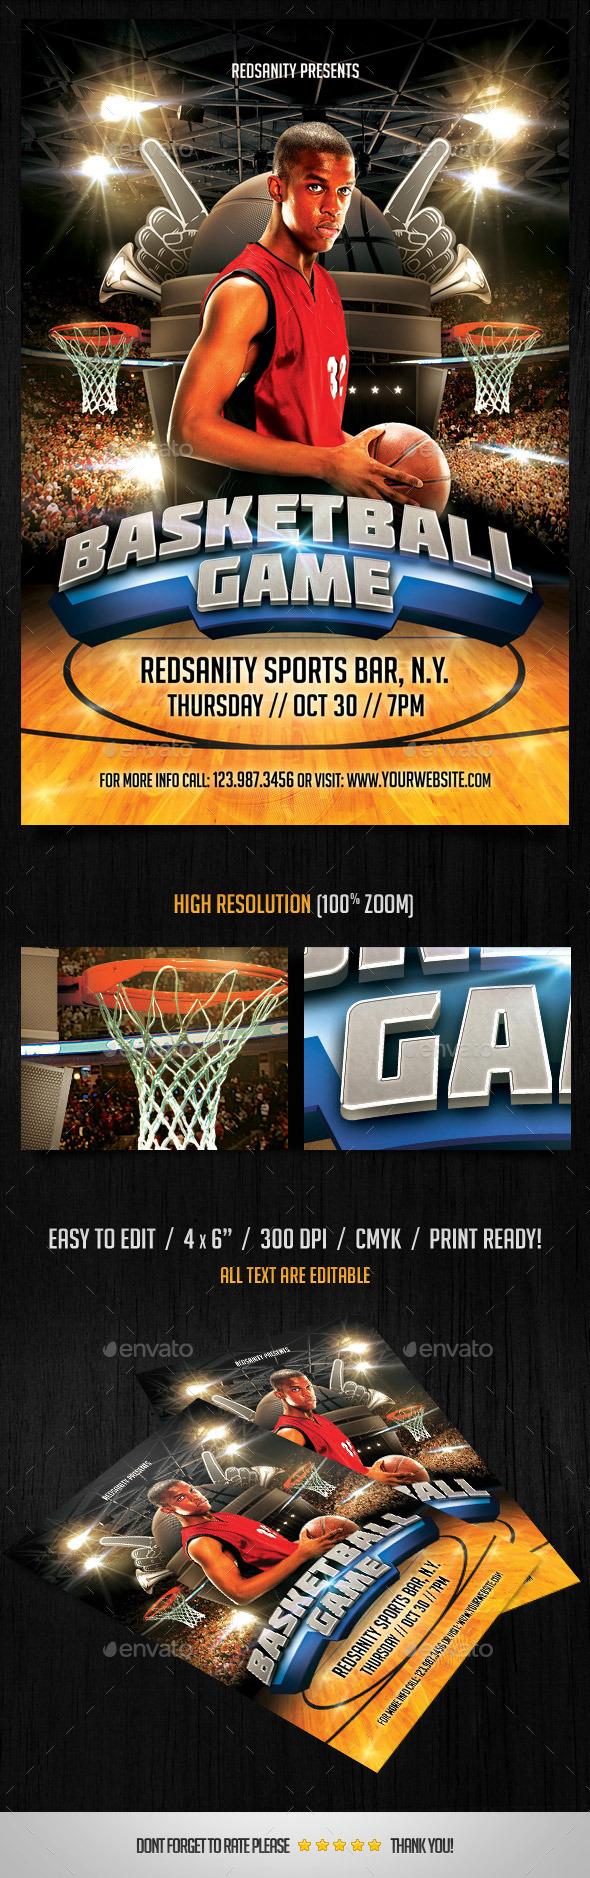 GraphicRiver Basketball Game Flyer 9122590